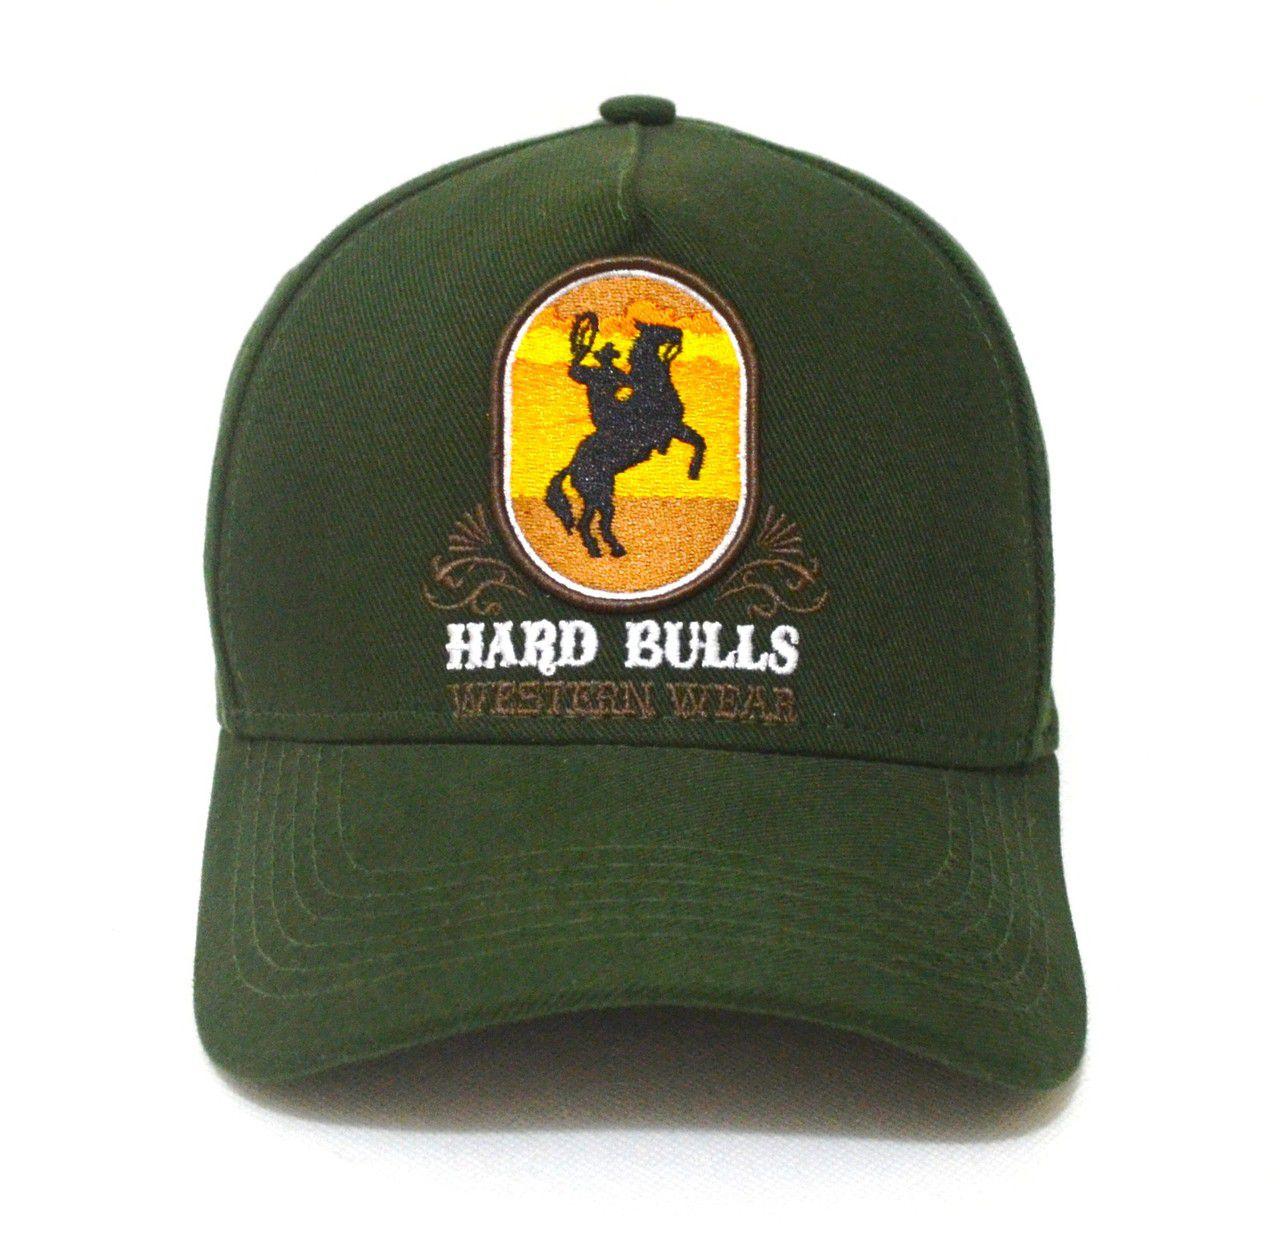 7ae8bd6a36412 Boné Country Verde Militar Hard Bulls Western Wear Aba Curva